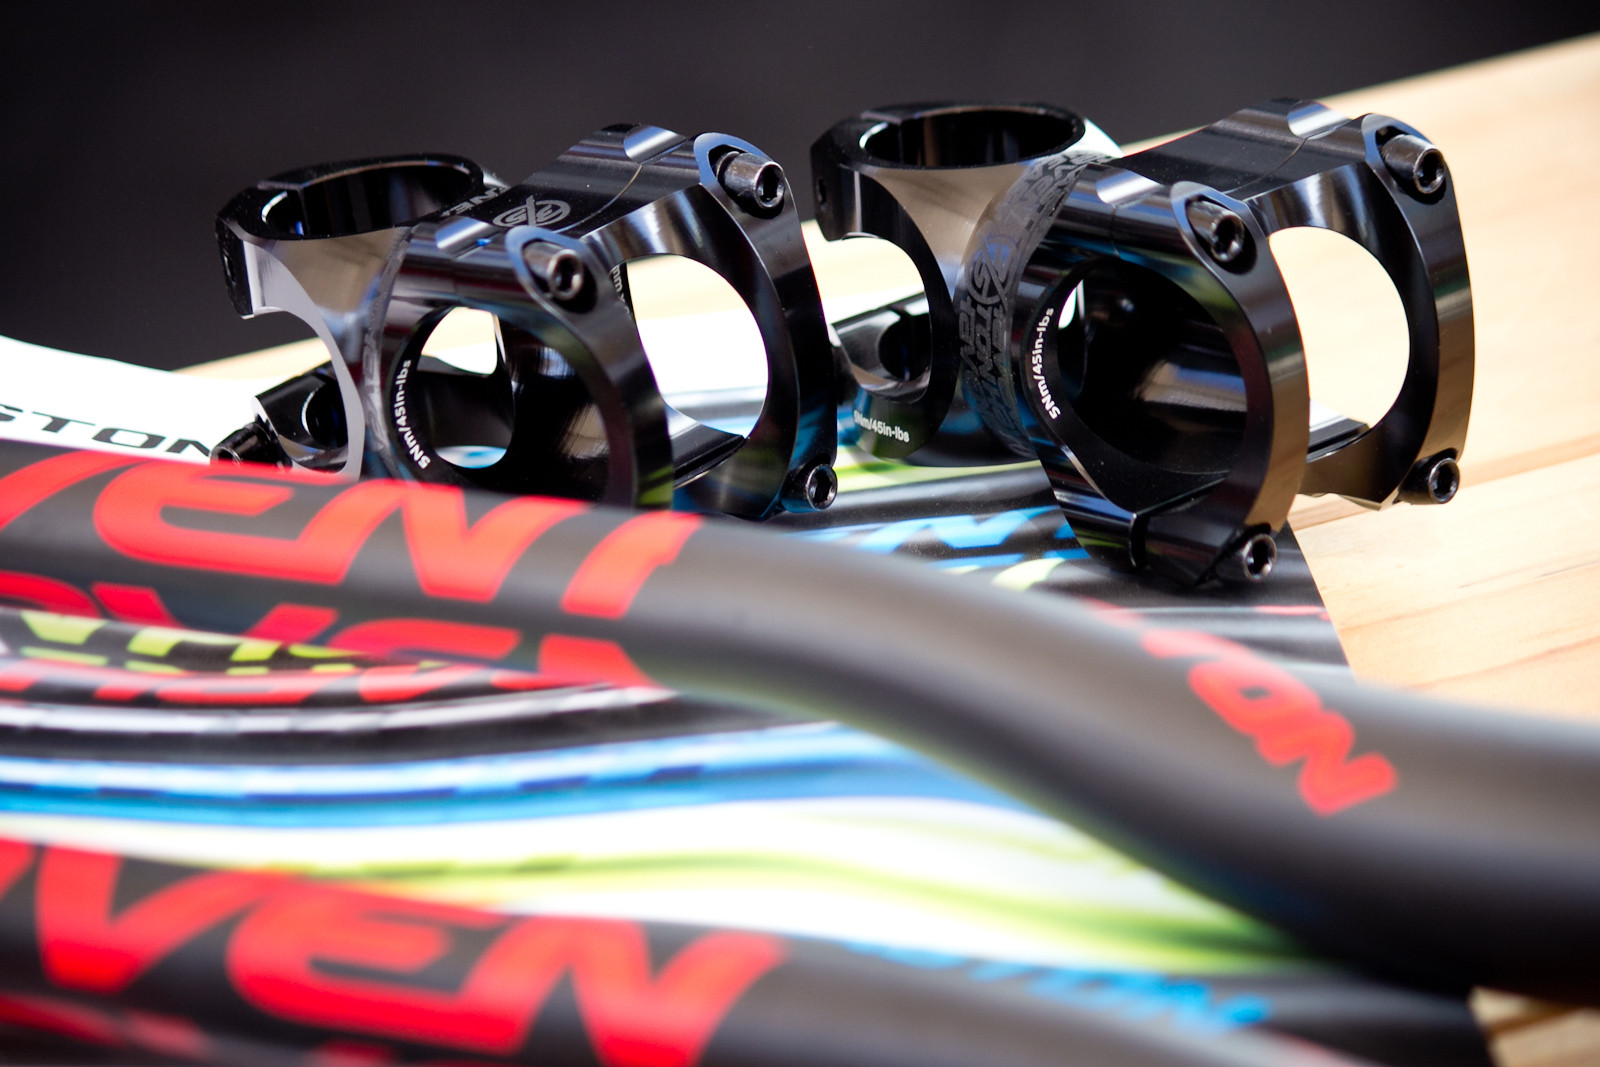 Easton Haven 35 Stems - Sea Otter Classic - 2014 Sea Otter Classic Pit Bits - Final Edition - Mountain Biking Pictures - Vital MTB